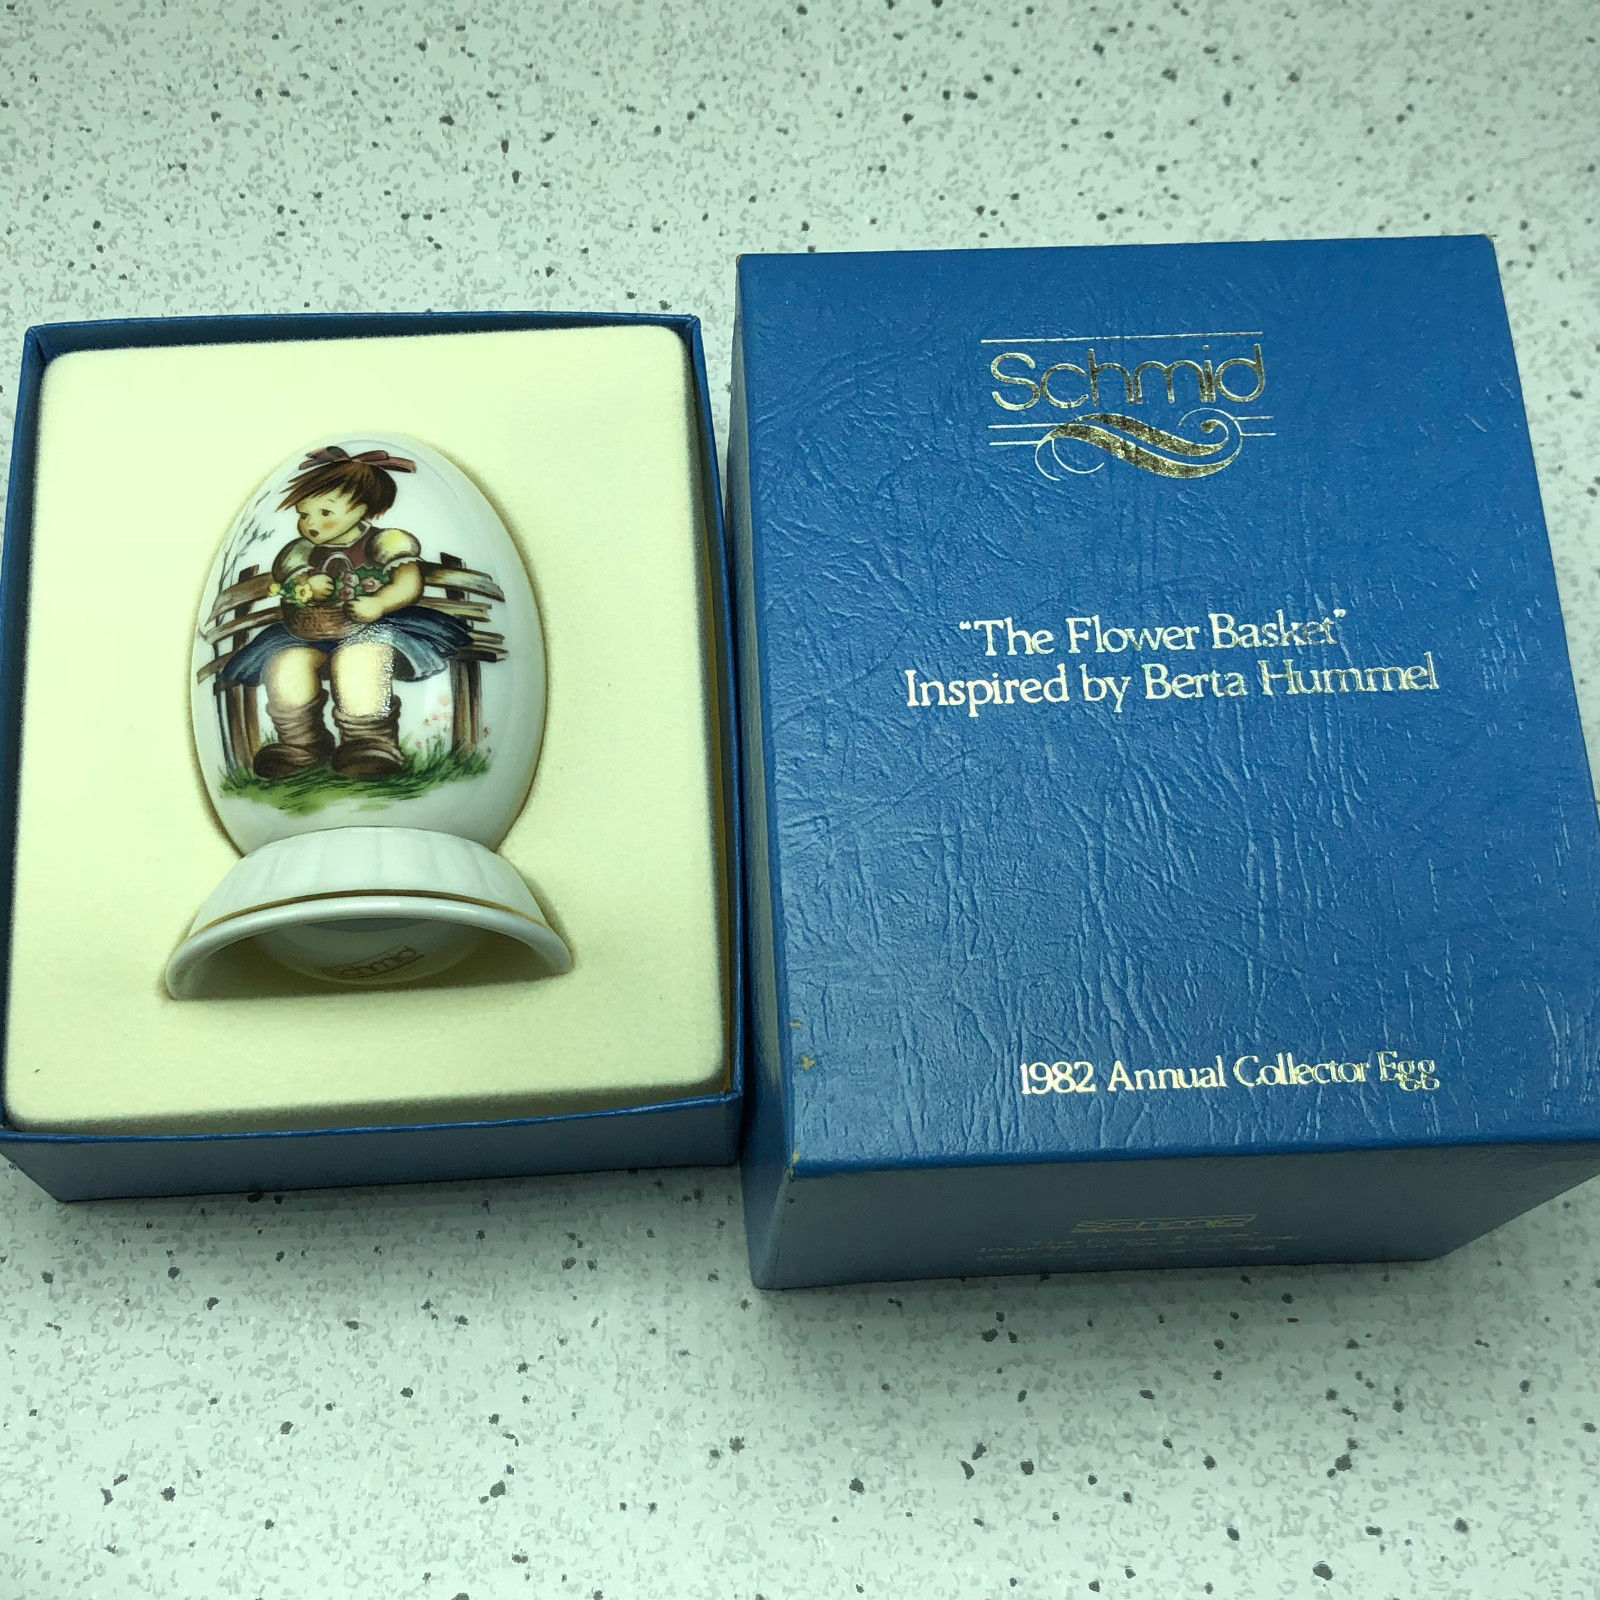 1982 SCHMID BERTA HUMMEL GOEBEL ANNUAL EASTER EGG figurine flower basket 177301